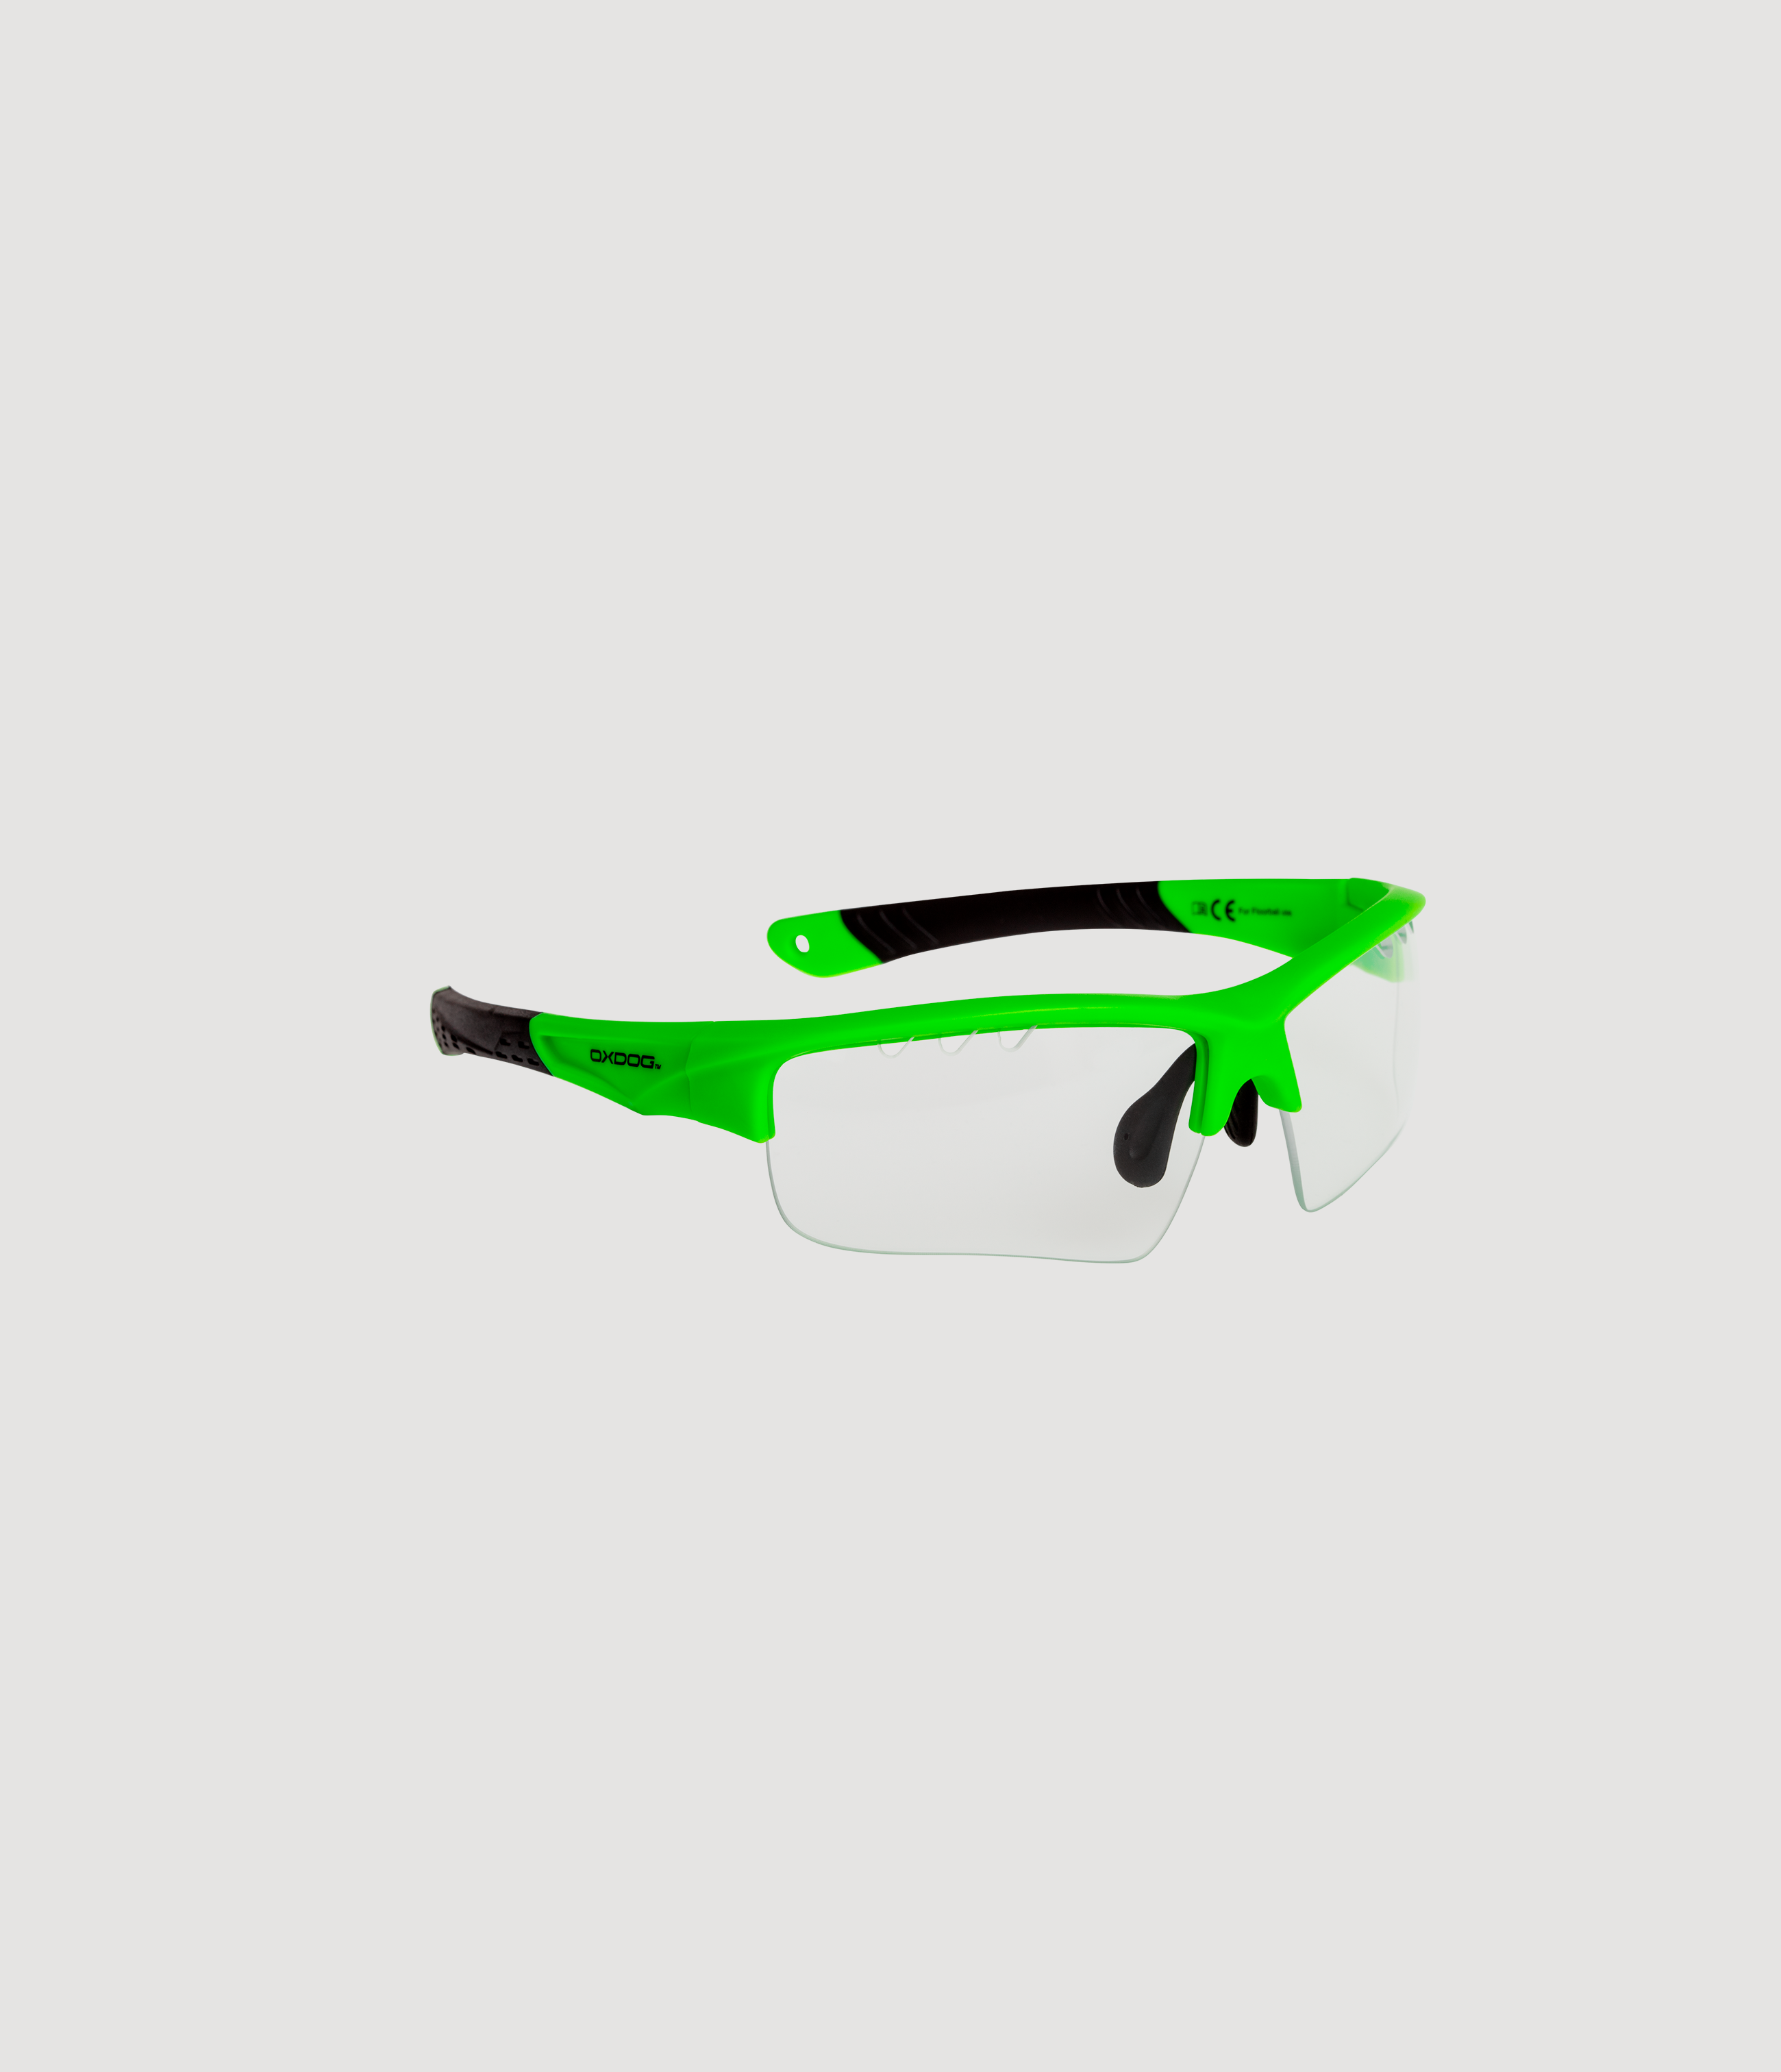 Spectrum Eyewear Green